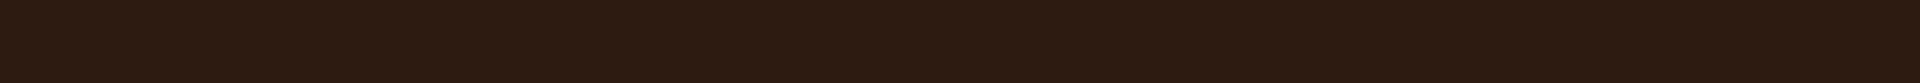 footer-grass-border-short-brown-web-io